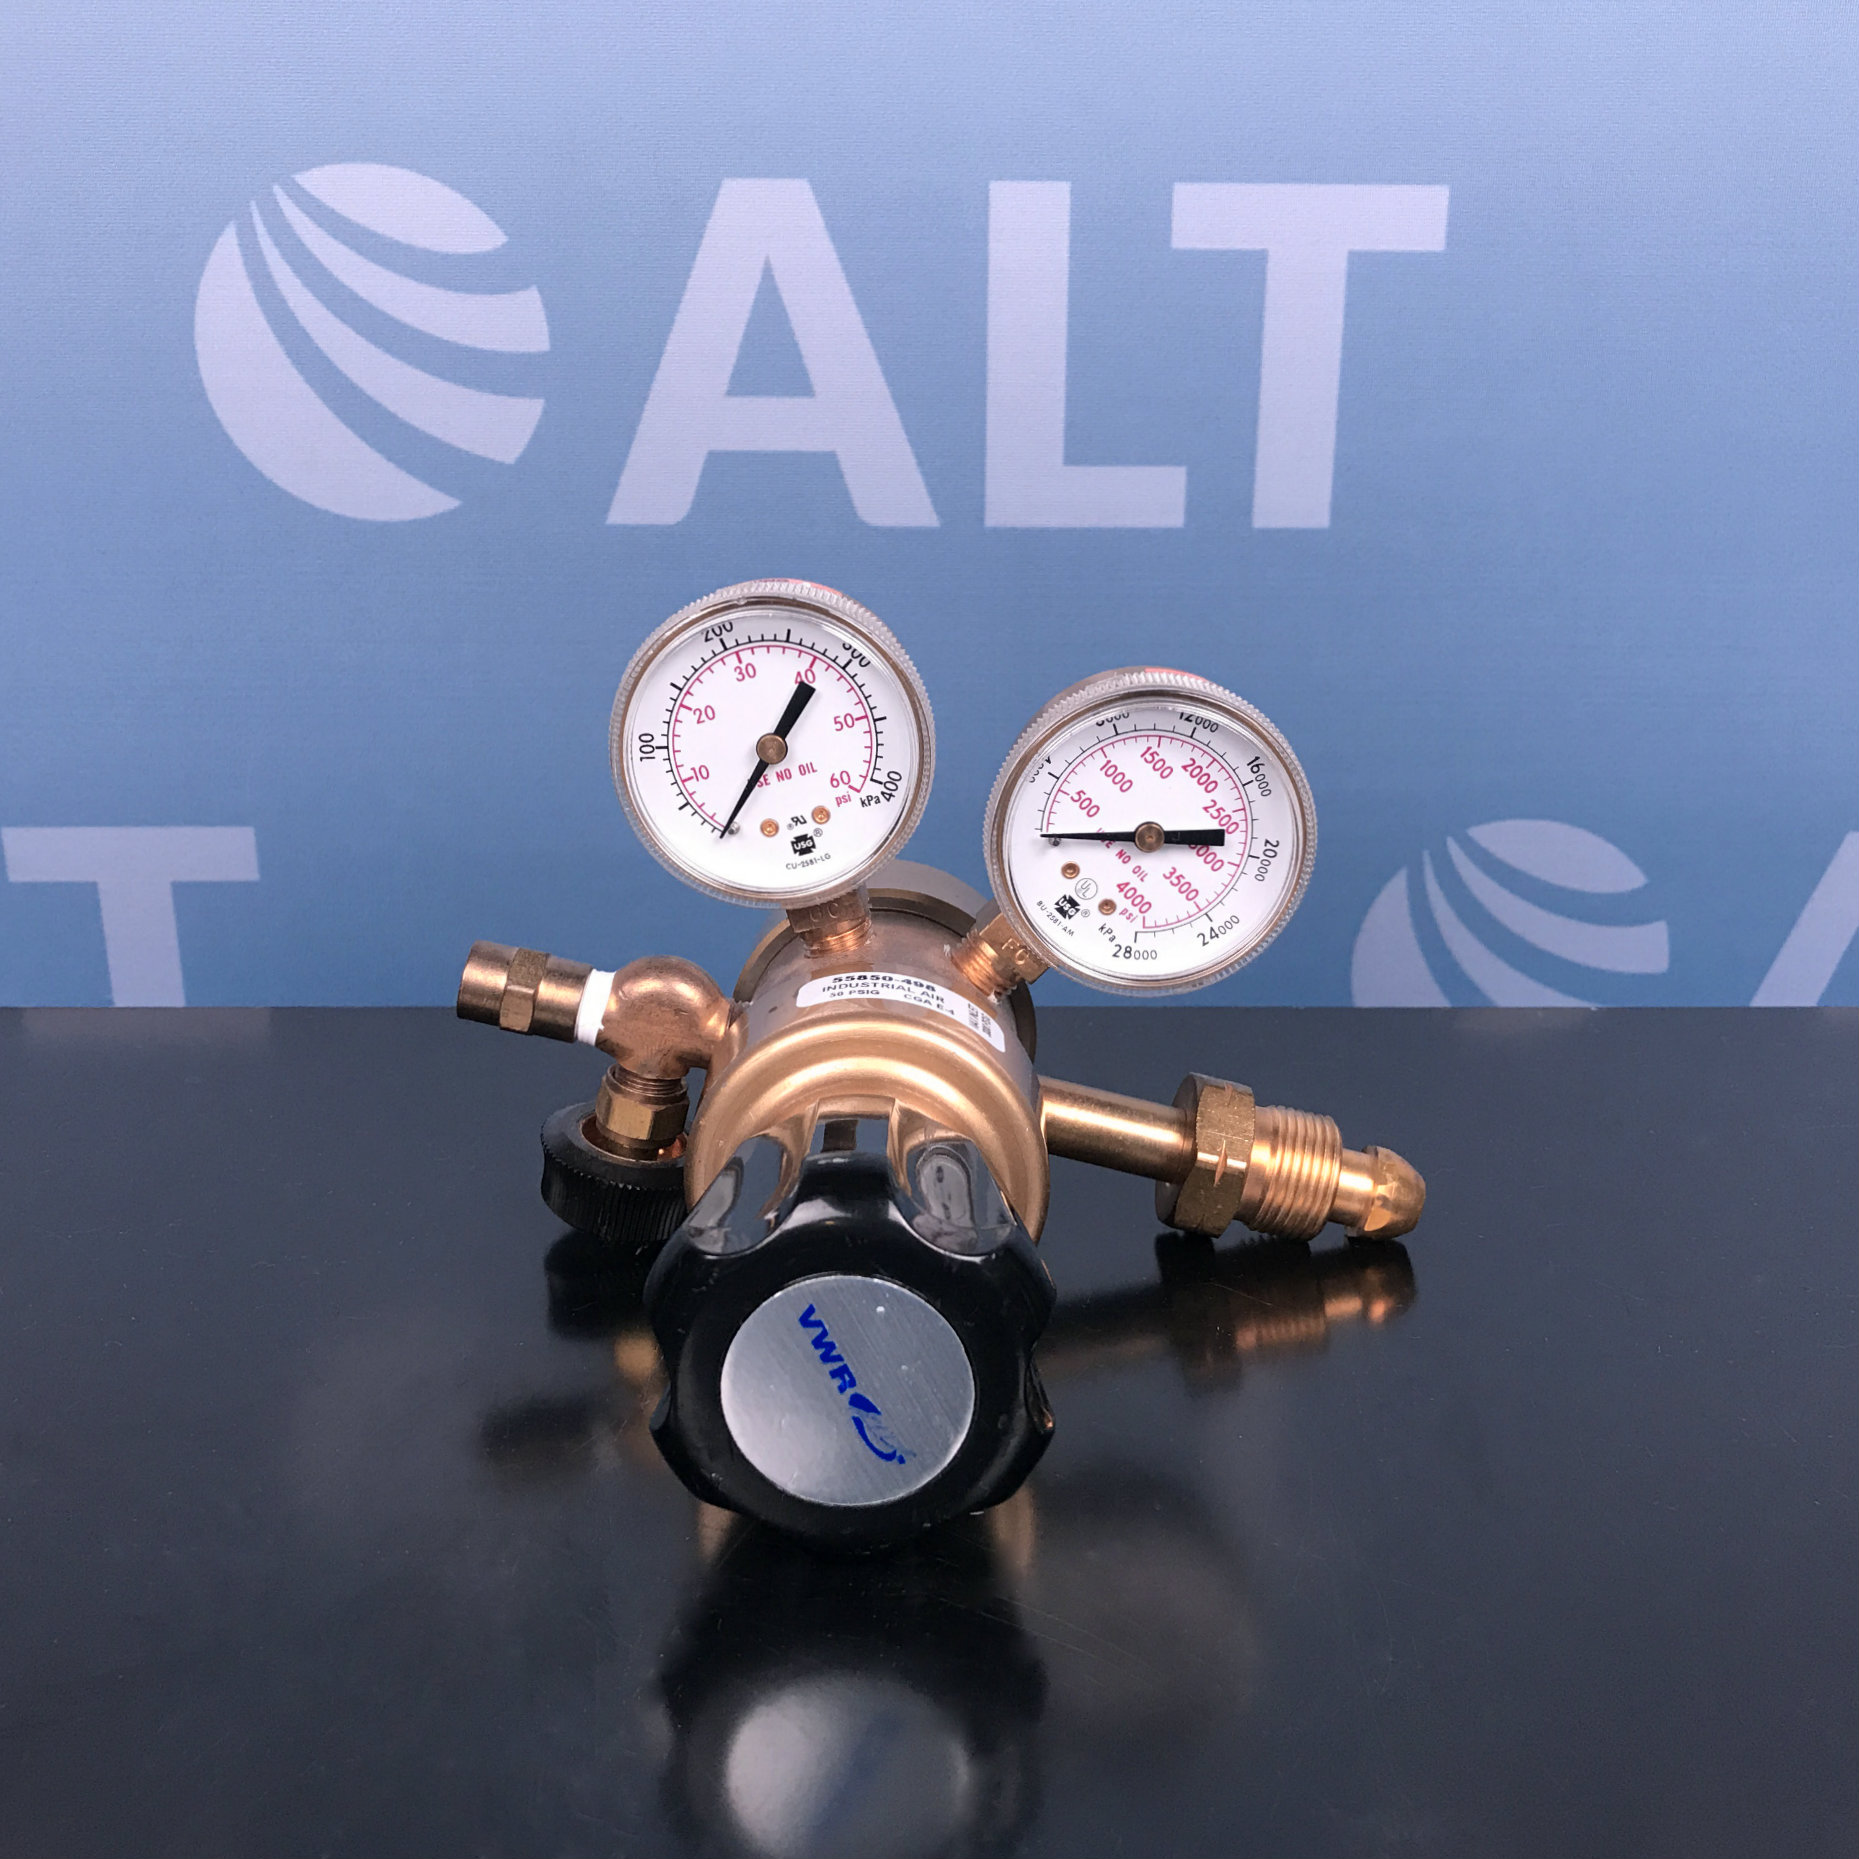 VWR Scientific Multistage Gas Regulator with Neoprene Diaphragm Cat No. 55850-496 (Breathing Air) Image